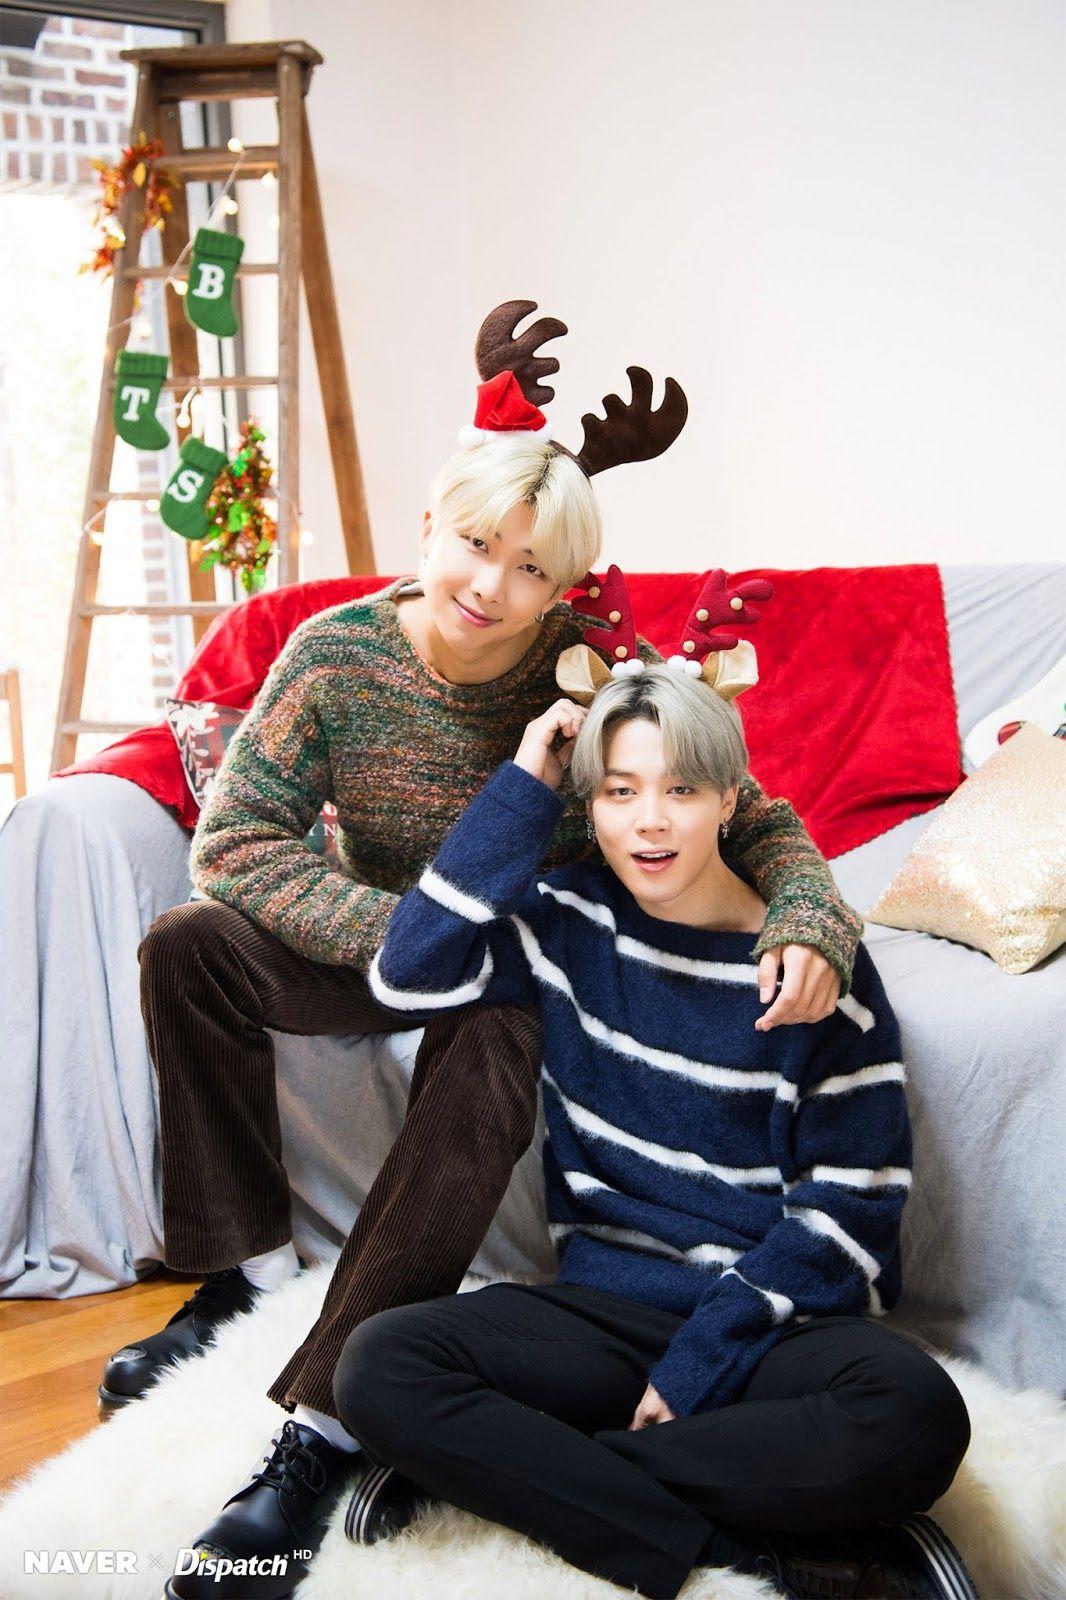 Naver X Dispatch Bts Christmas Special 2019 Photoshoot Circuits Of Fever In 2020 Bts Christmas Christmas Special Bts